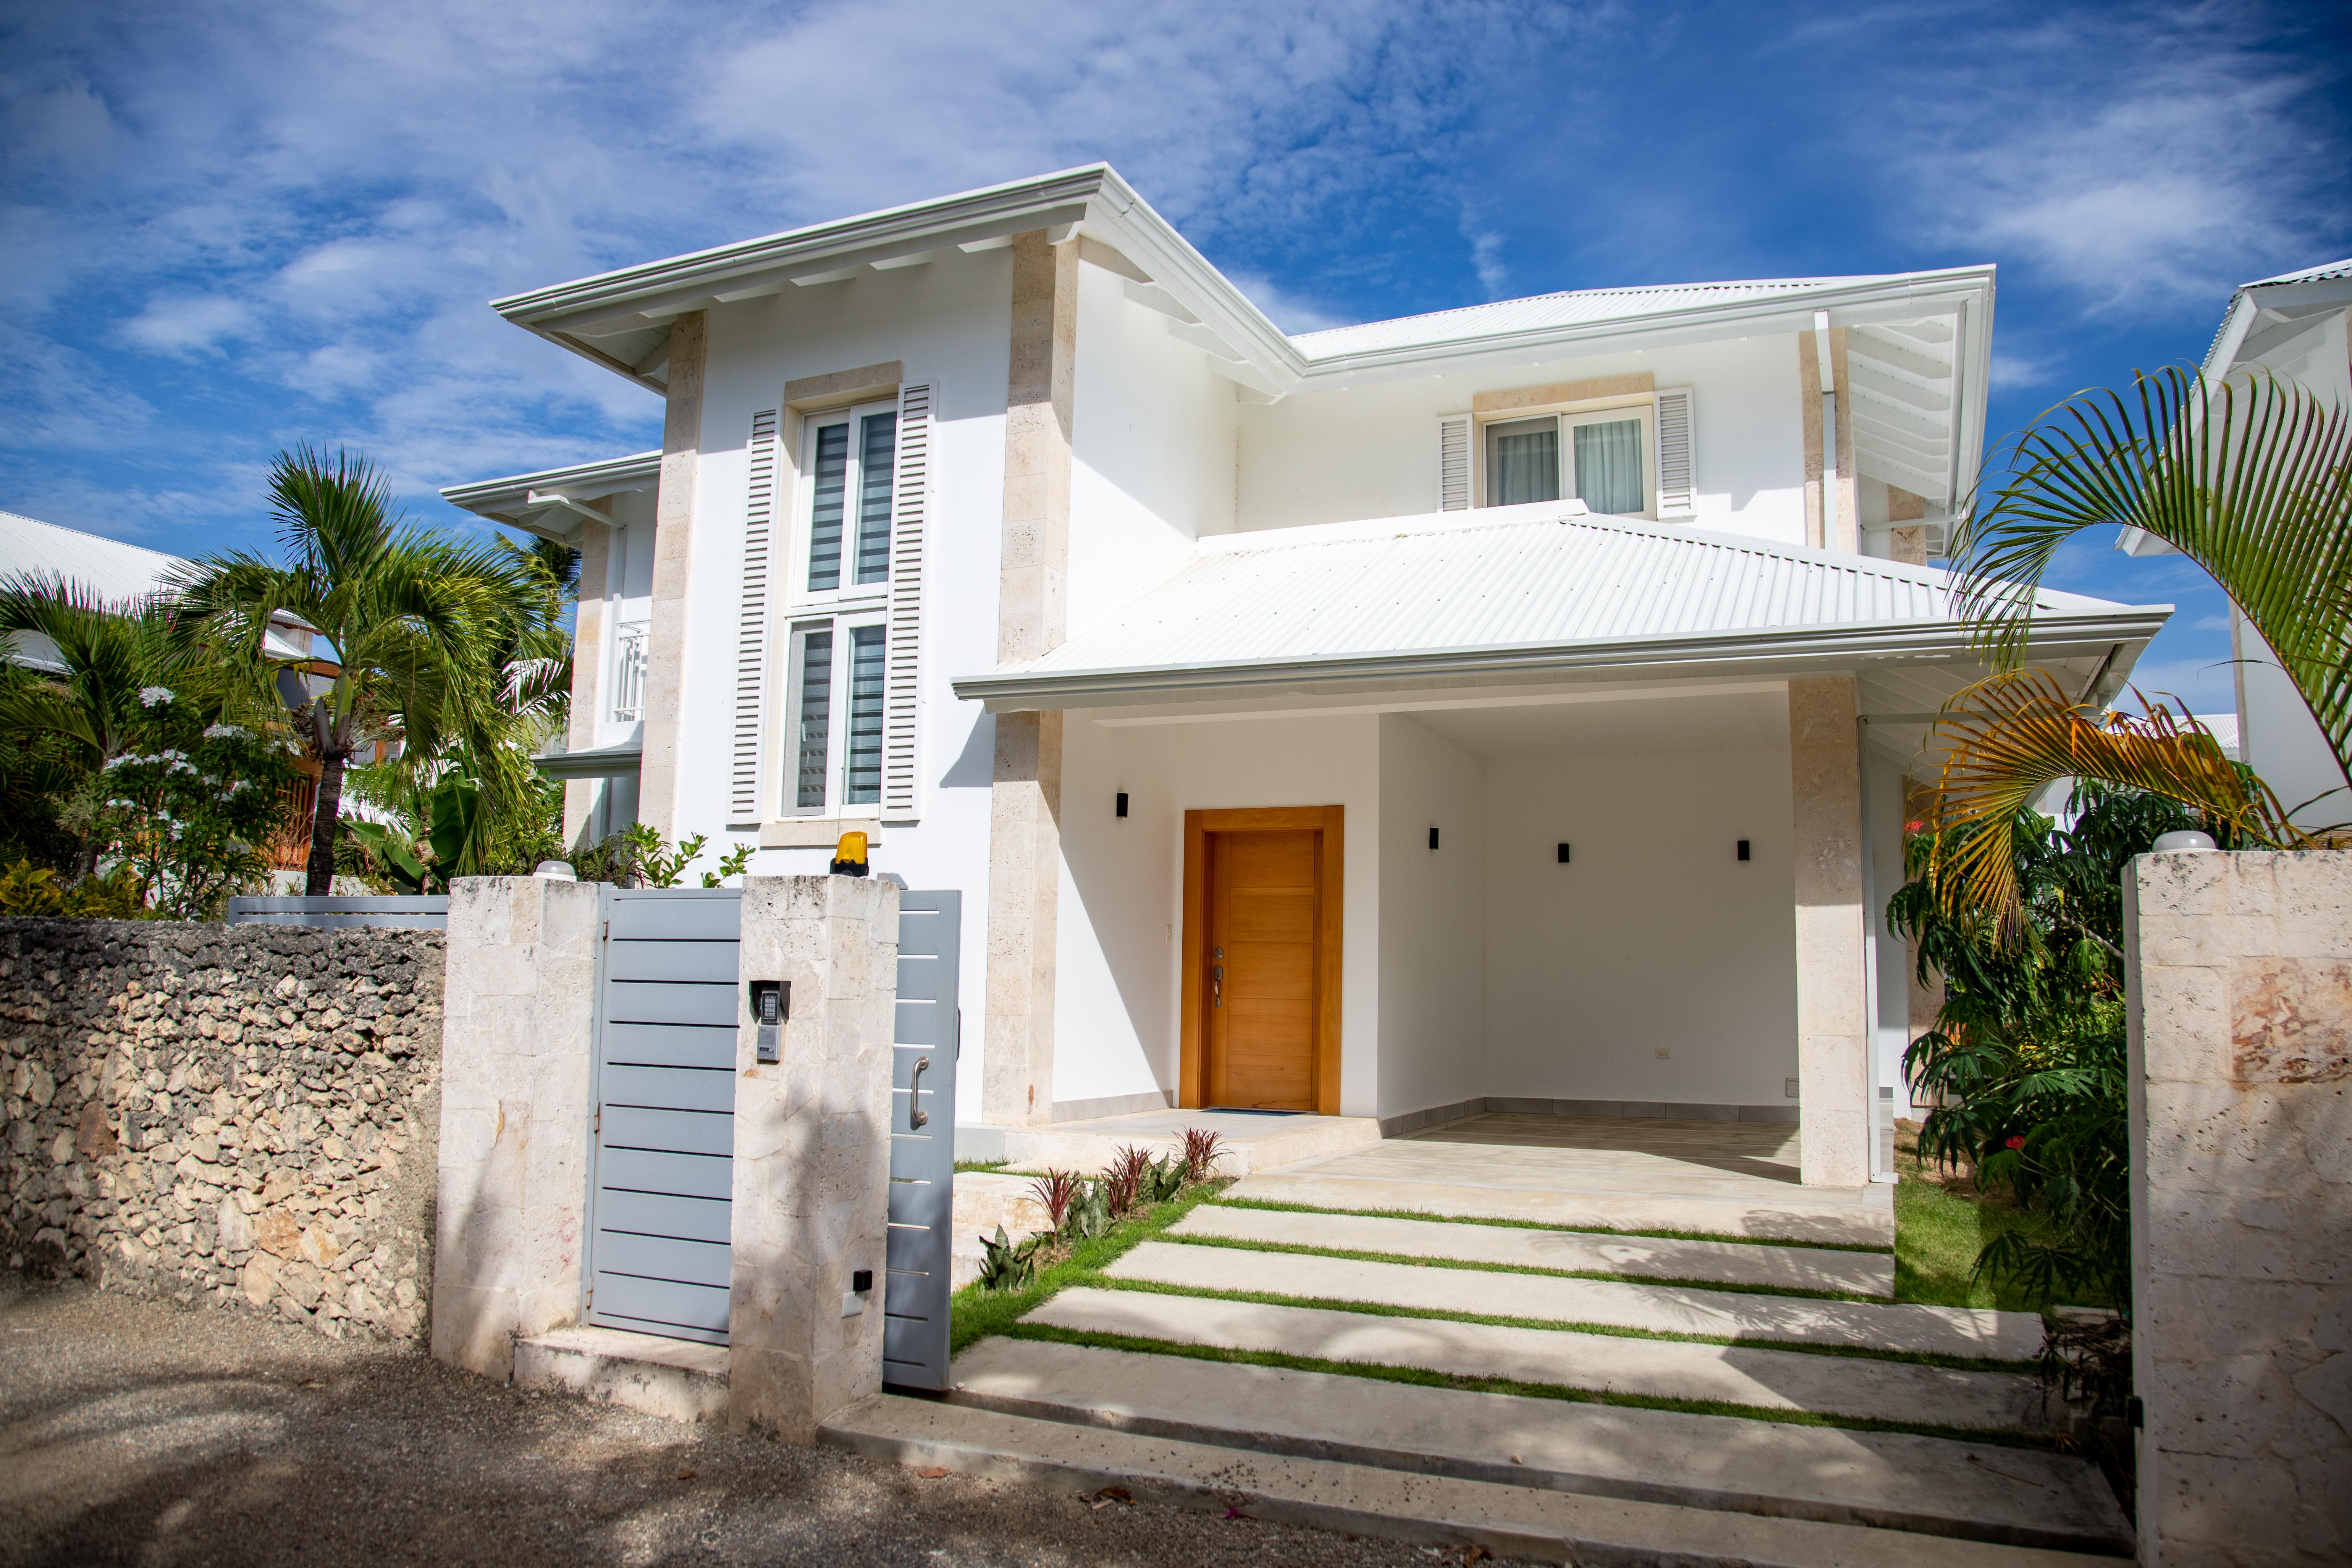 Front View of Villa Victoria Residencial Millennium